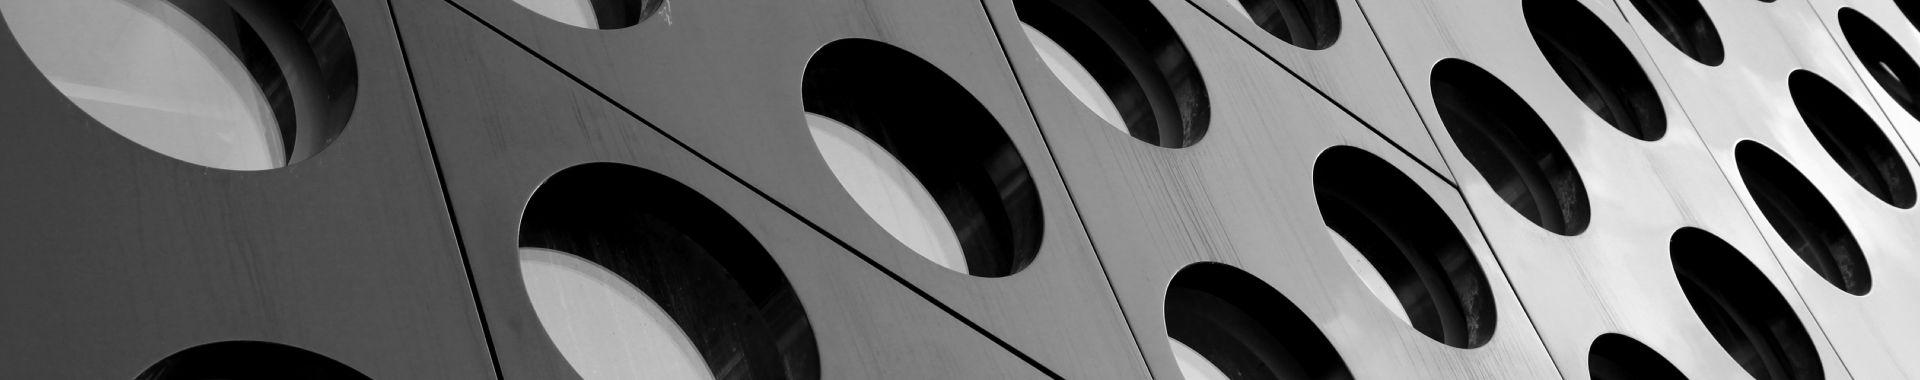 1920x438-Whatwedo-public&industrial.jpg